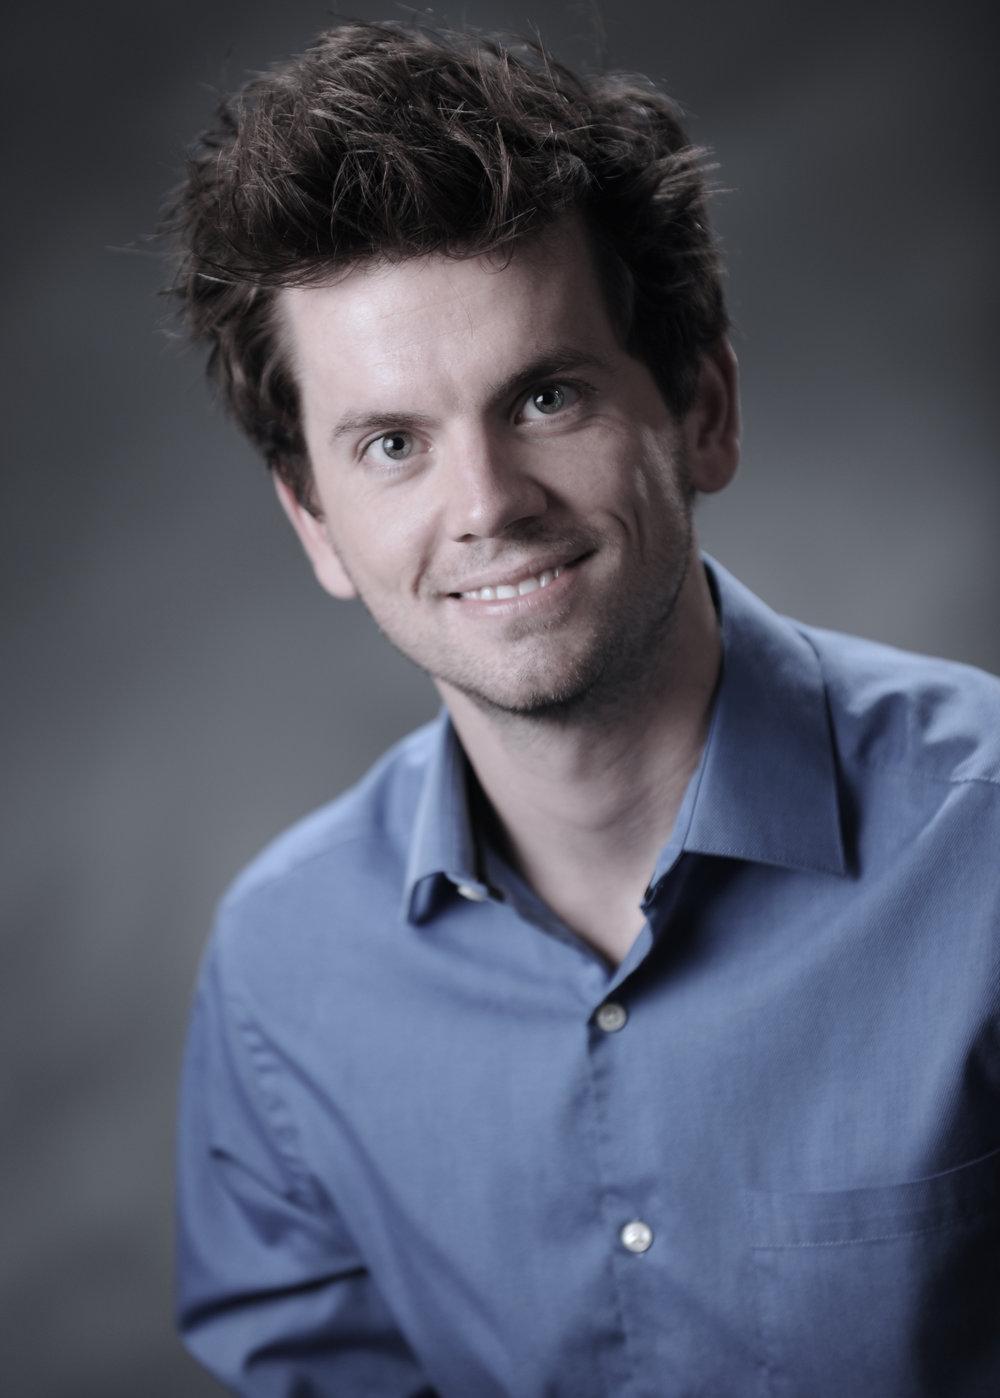 David McCracken Headshot (Blue Shirt).JPG